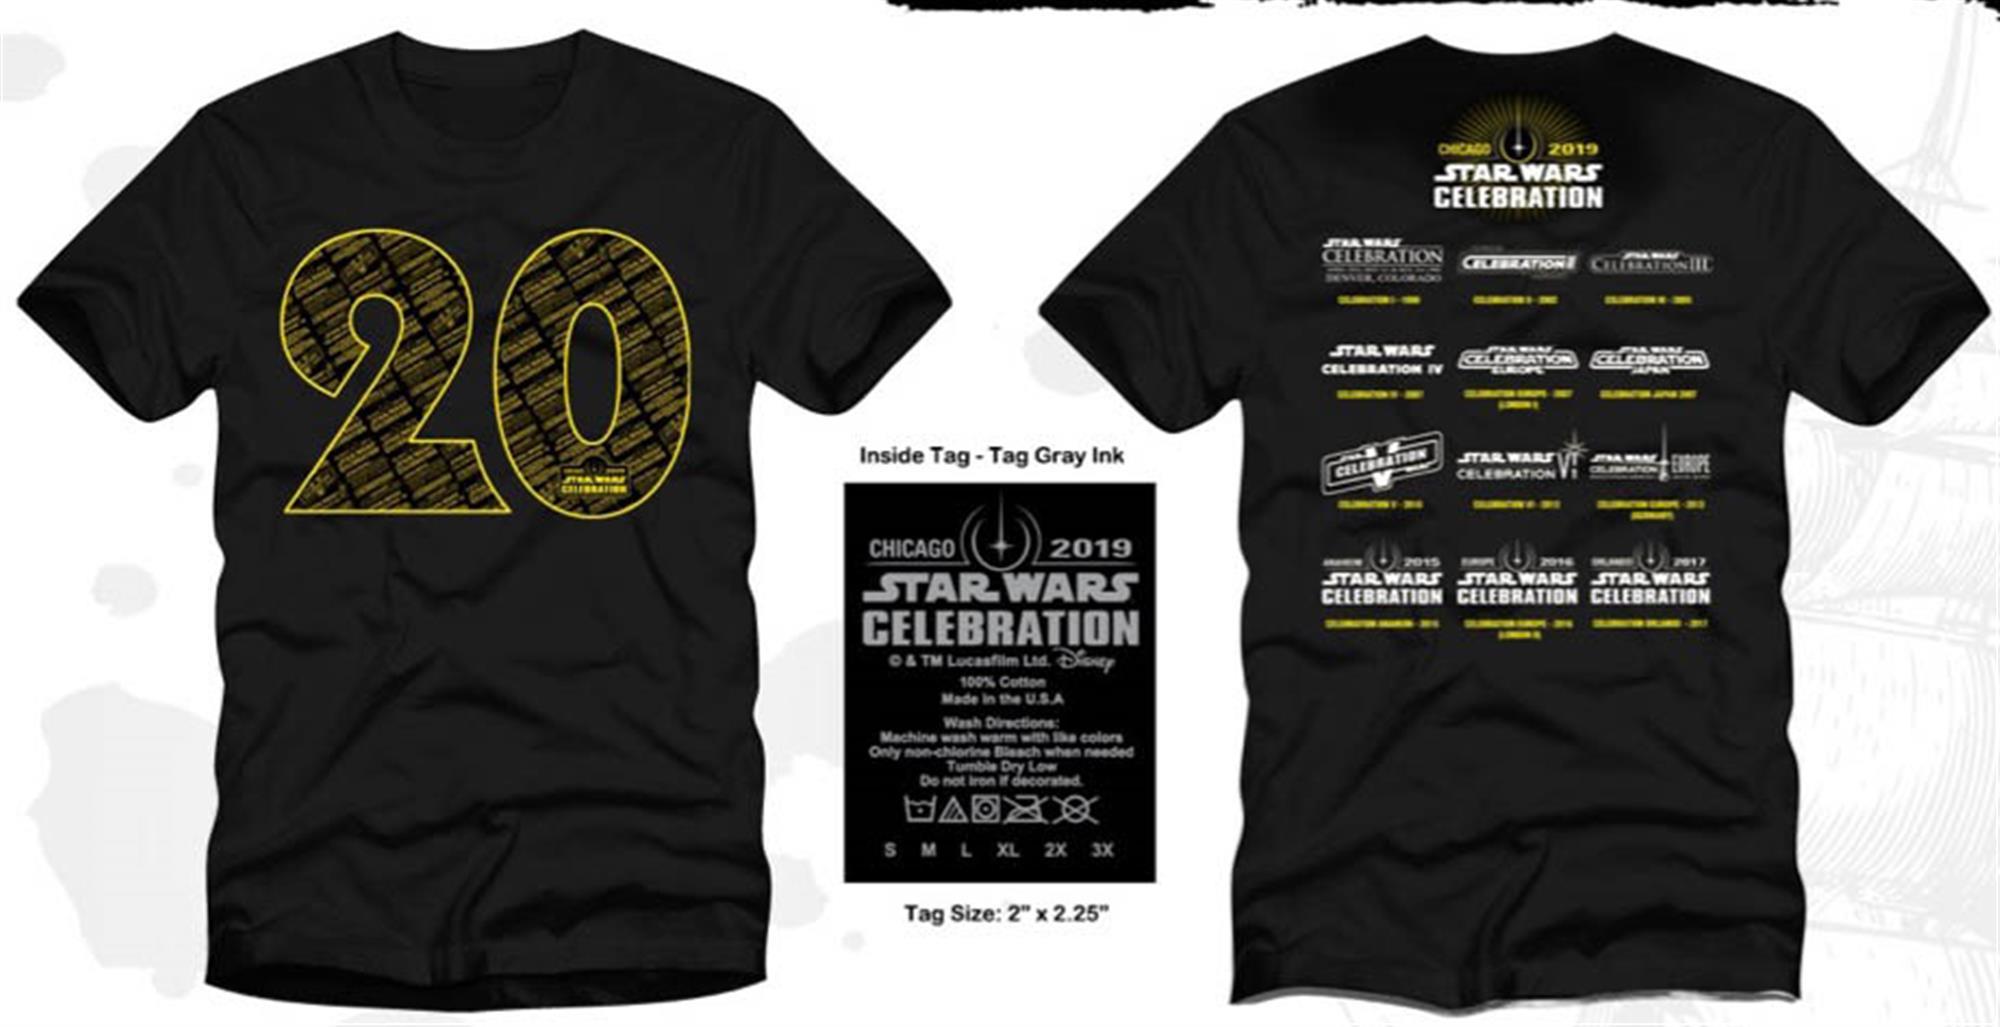 Star Wars Shares Sneak Peek at Star Wars Celebration